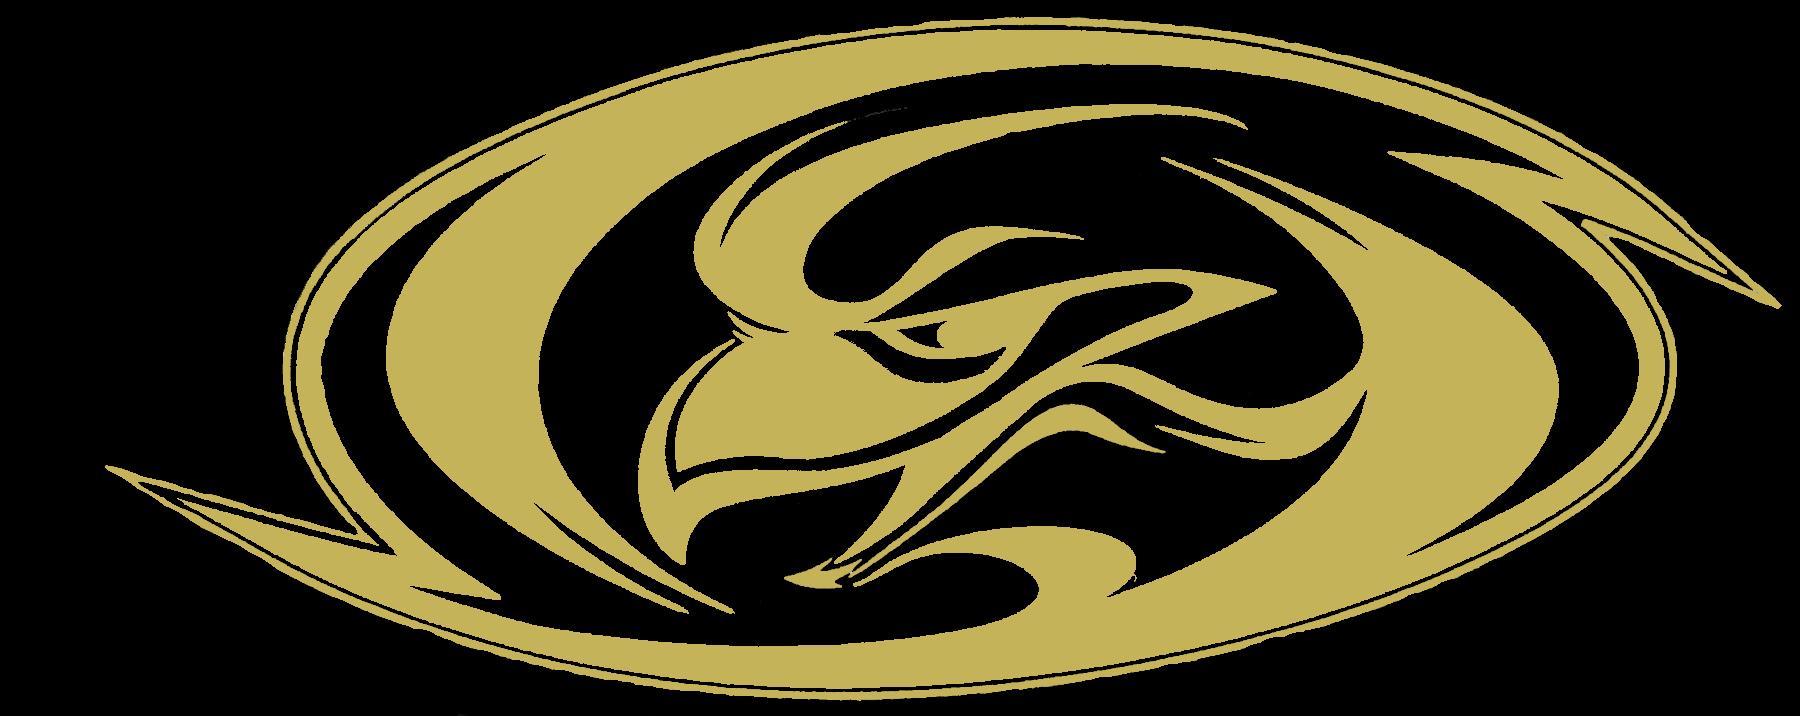 Hawks edge Eagles in OT